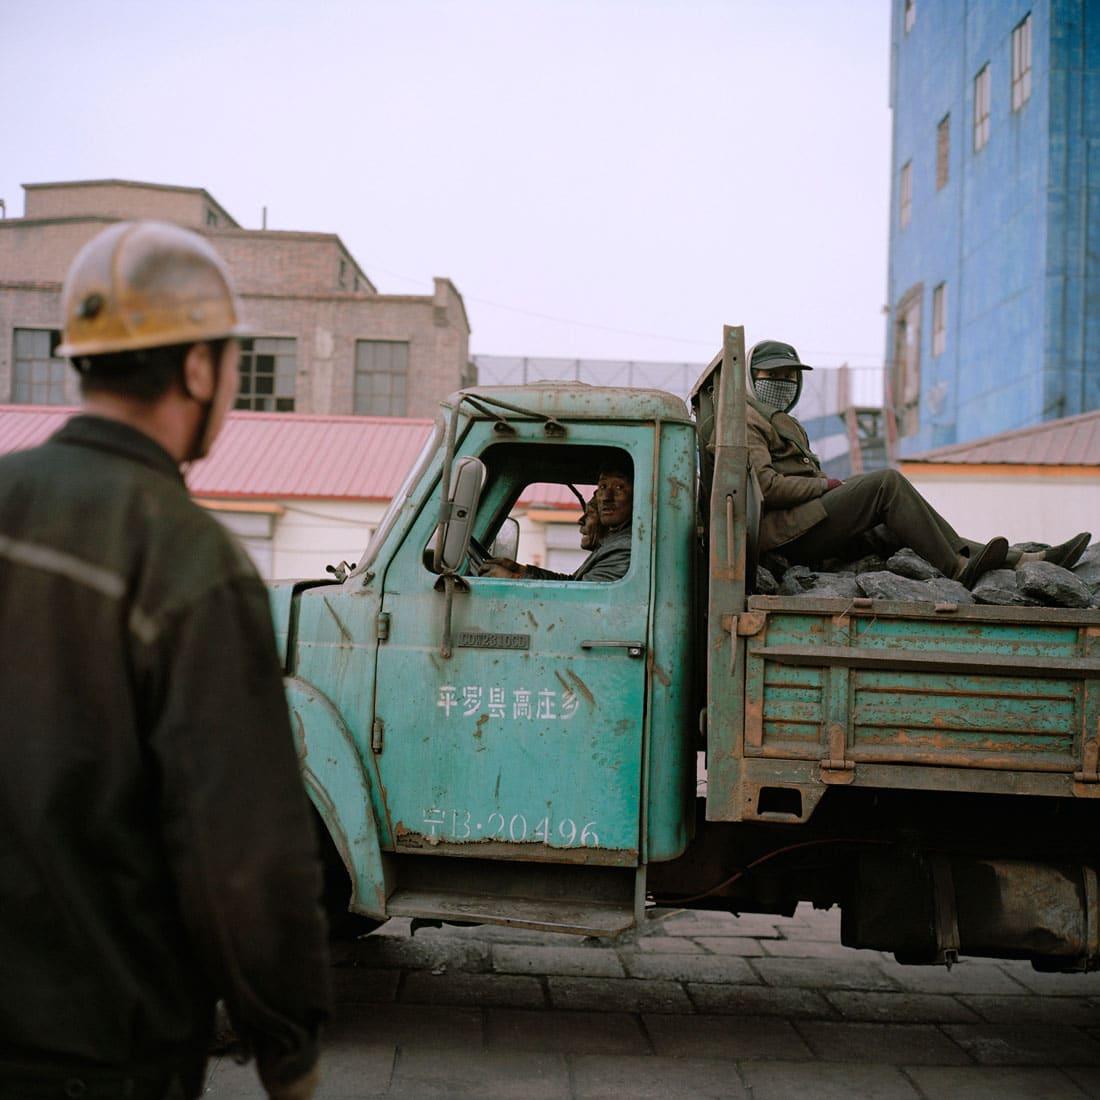 China, Binnen Mongolie, Wuda, 10-03-2009 China, Inner Mongolia, Wuda, 10-03-2009 De Wu Hushan steenkolenmijn in Wuda (nabij Wuhai). PHOTO AND COPYRIGHT ROGER CREMERS